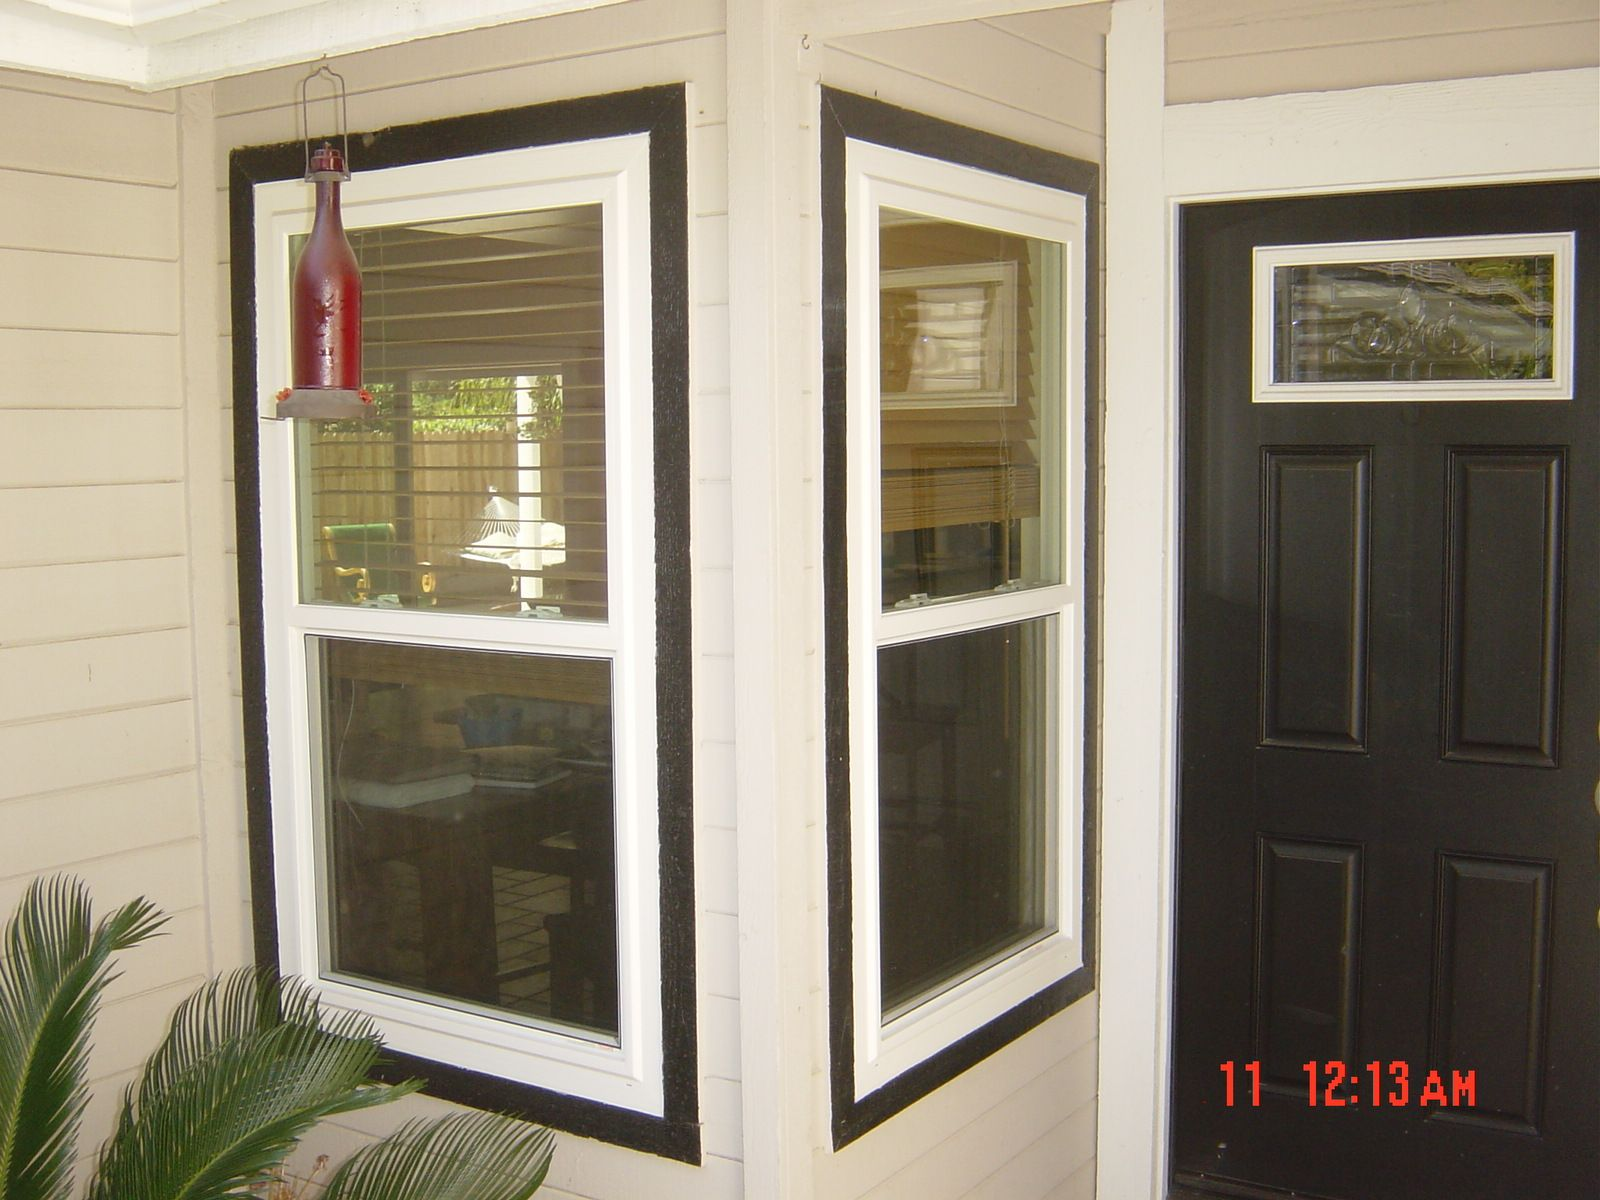 Anlin Windows Installed By Jz Construction Clovis Ca 93611